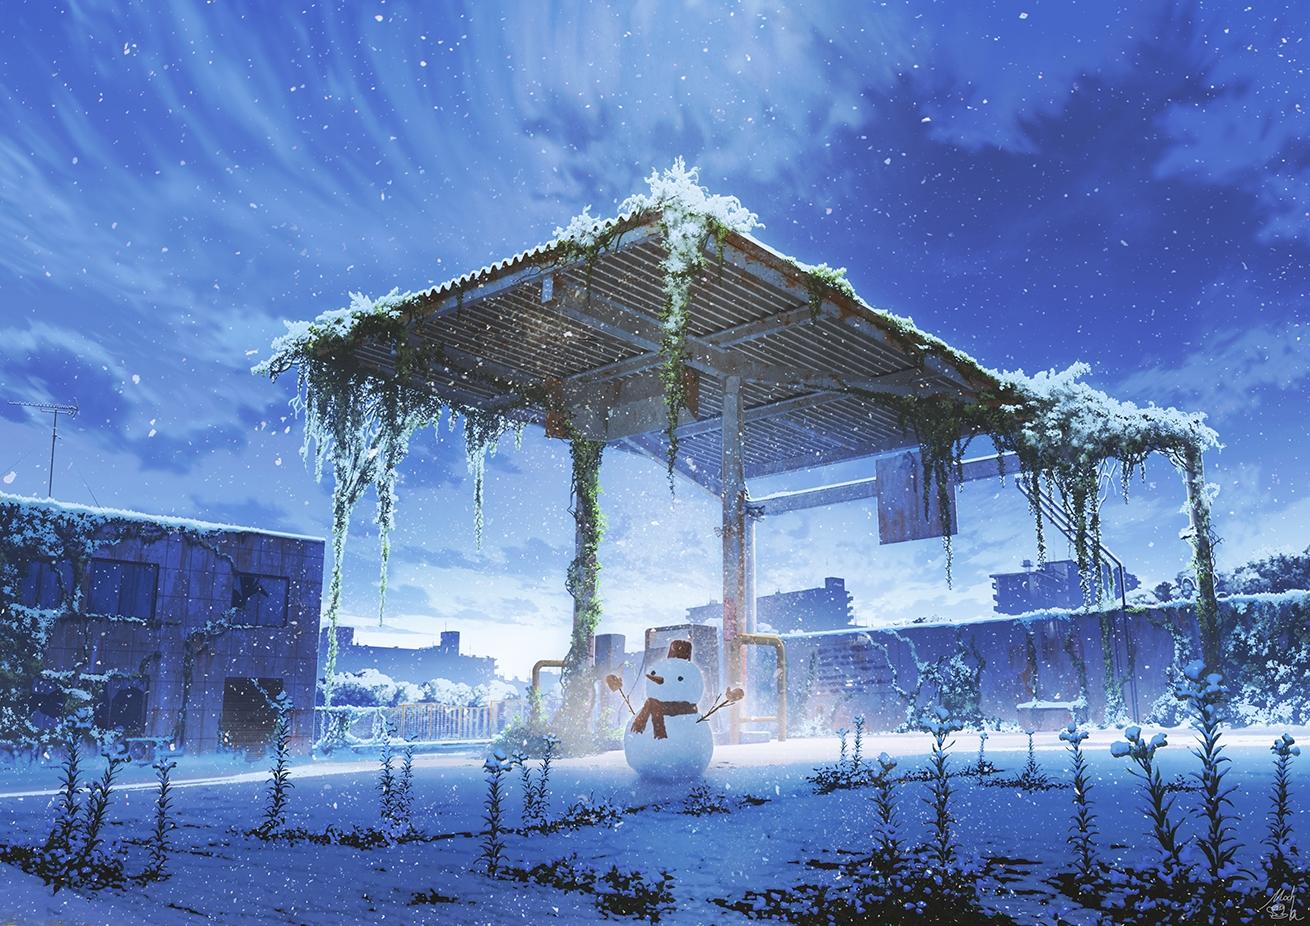 clouds mocha_(cotton) nobody original polychromatic ruins scenic signed sky snow snowman winter